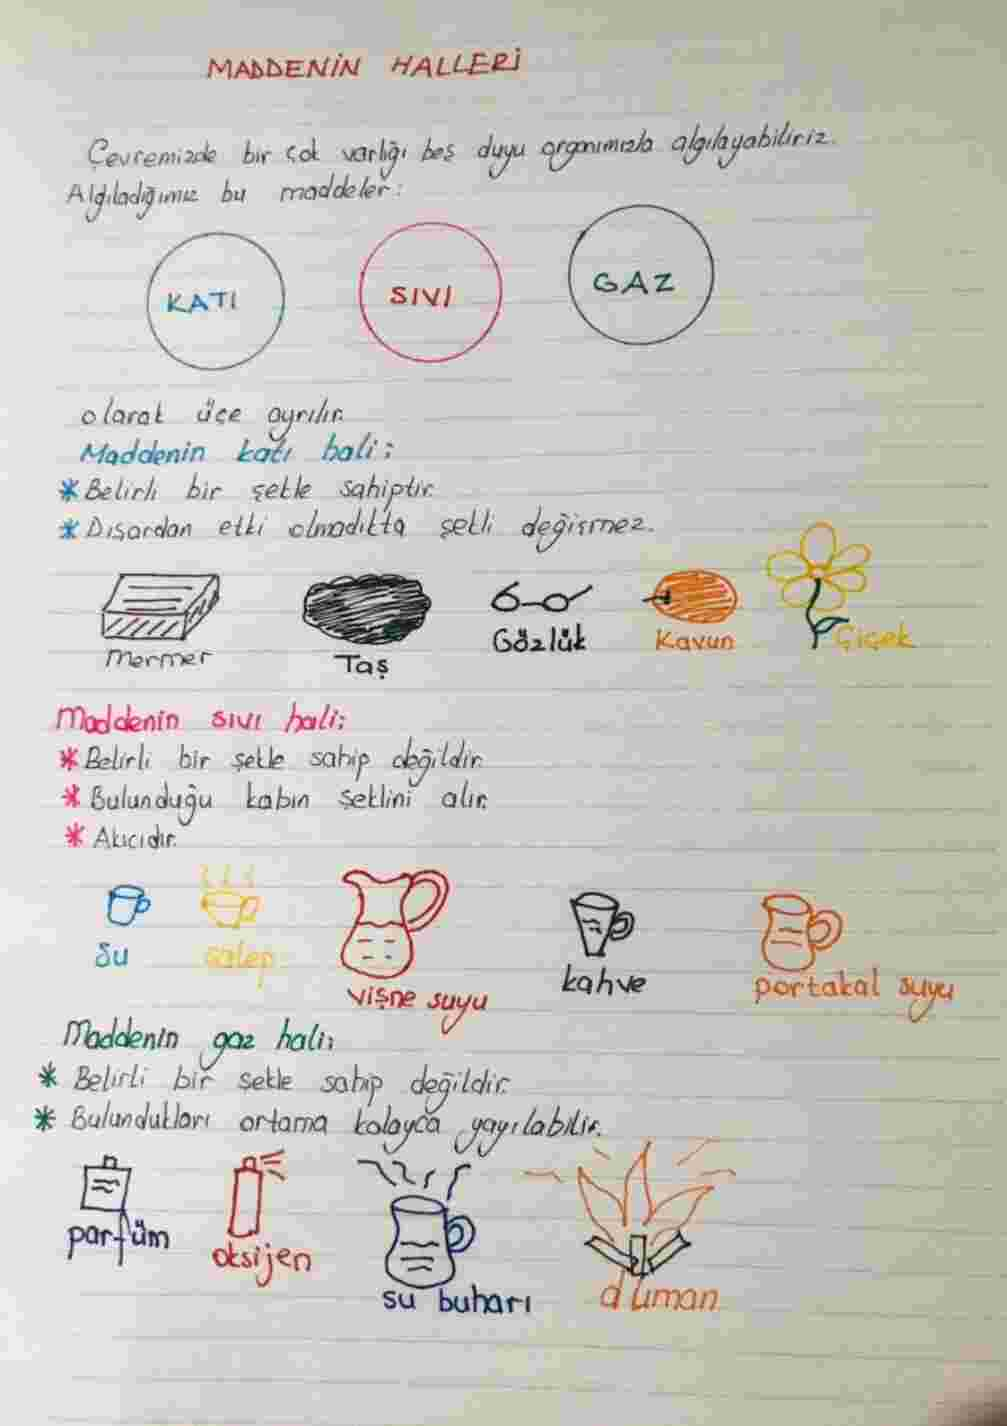 3. Sınıf Fen Bilimleri Maddenin halleri defter notu